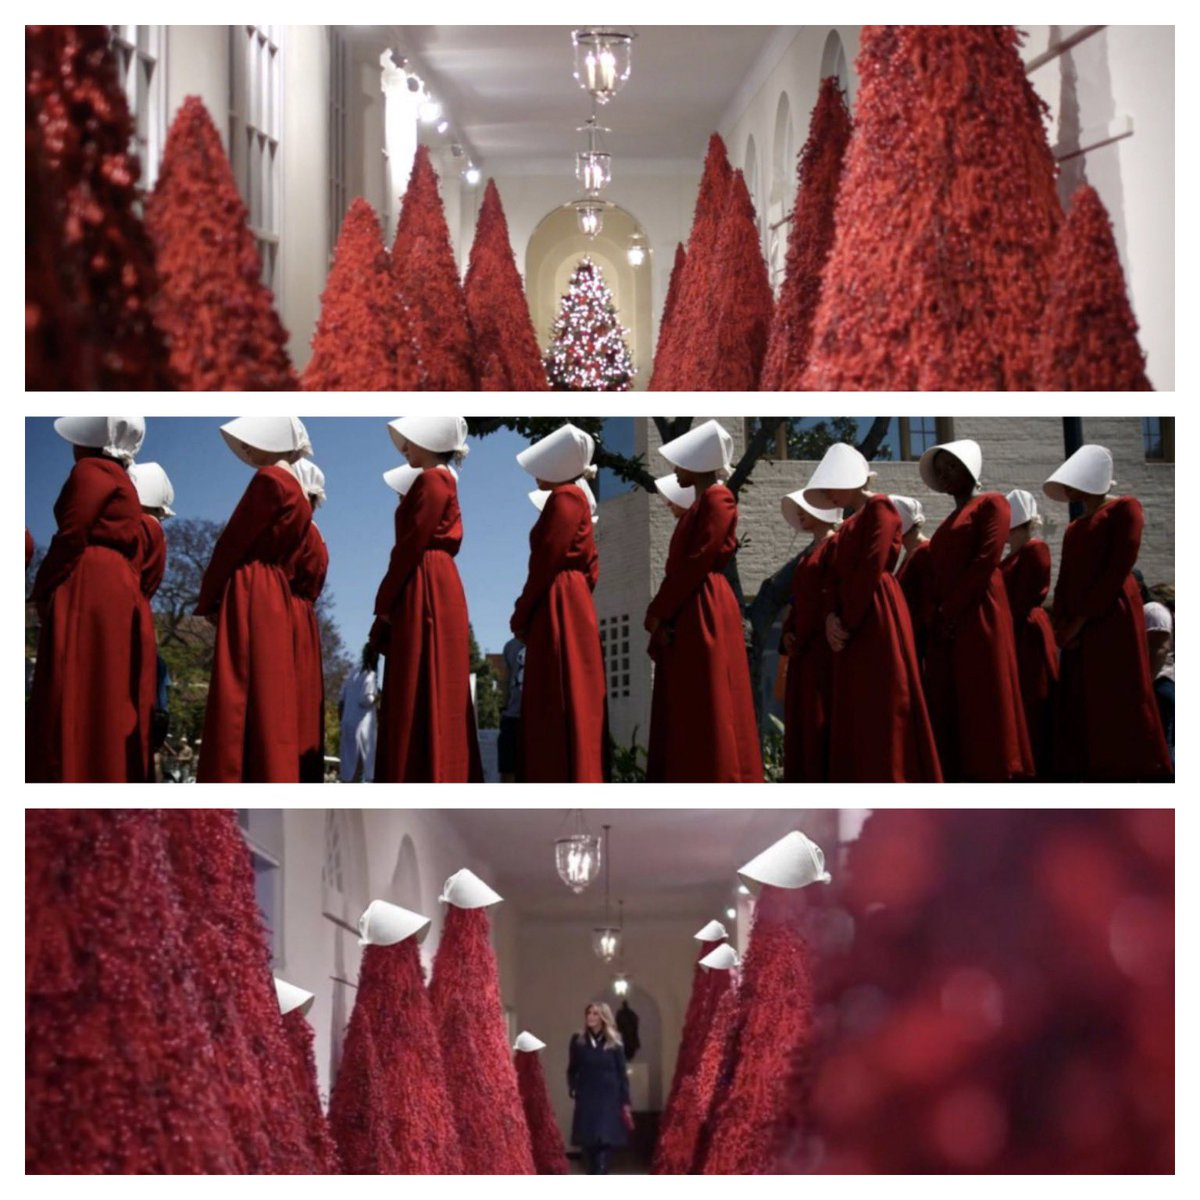 Melania S Red Christmas Trees Inspire Memes Twitter Funnies